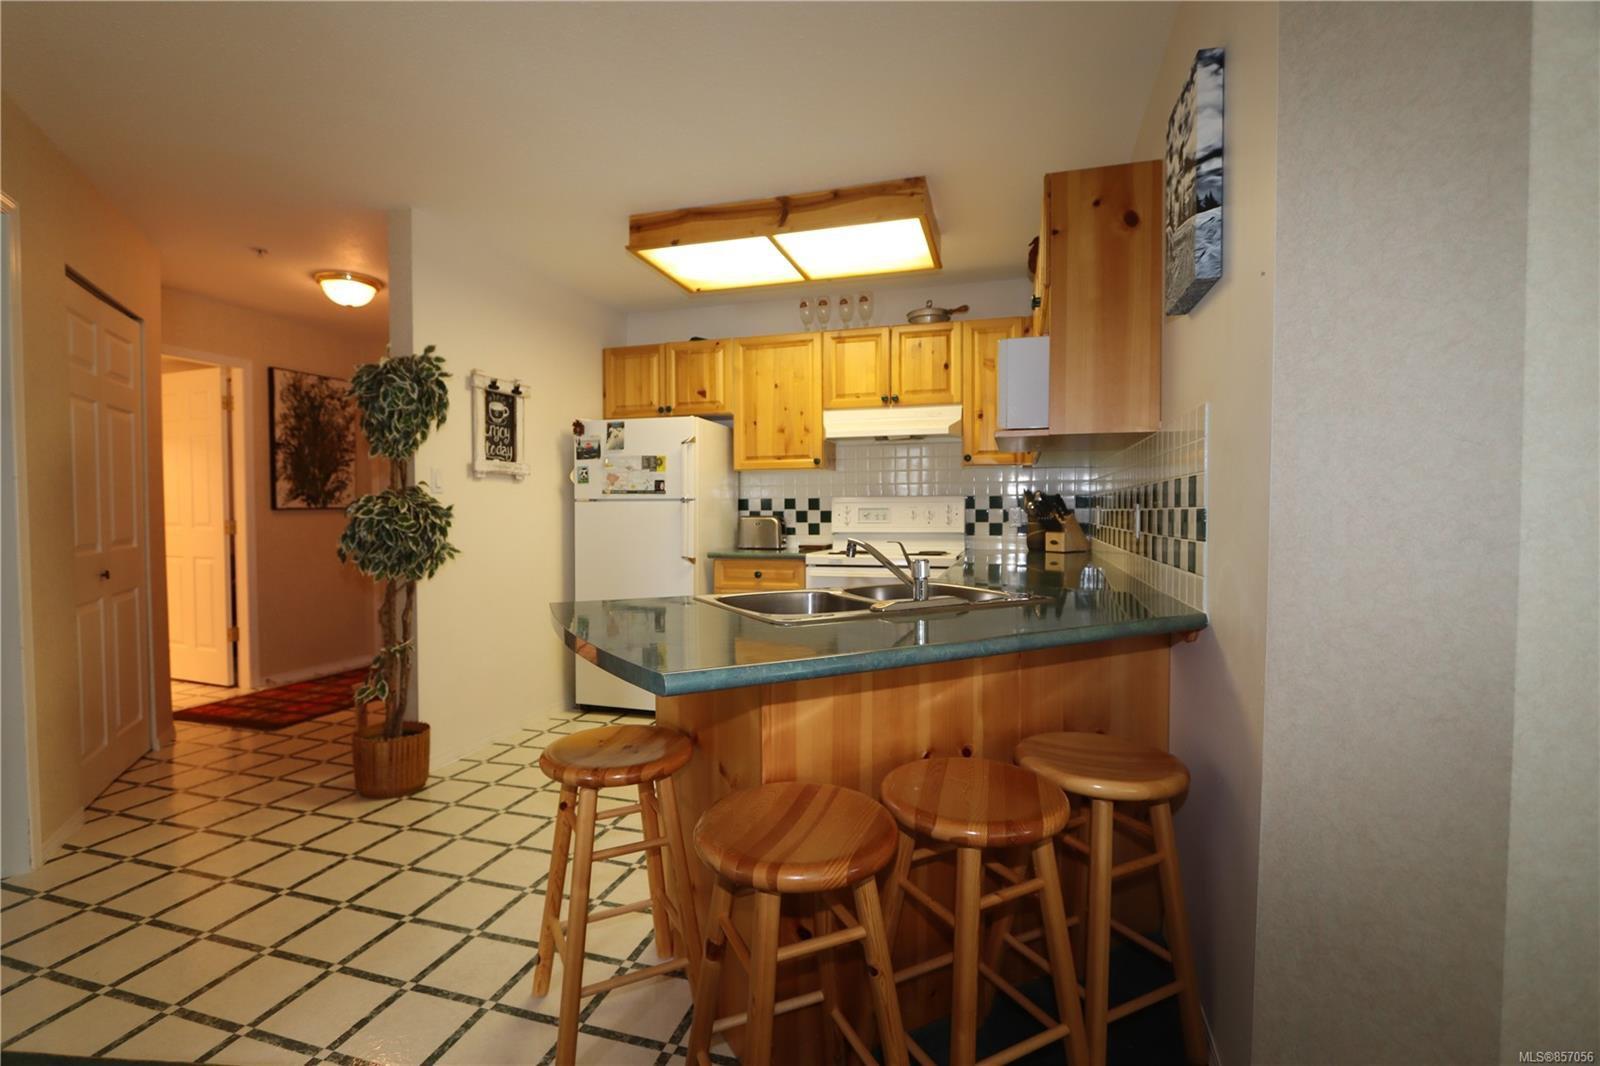 Photo 5: Photos: 118 1320 Henry Rd in : CV Mt Washington Condo for sale (Comox Valley)  : MLS®# 857056